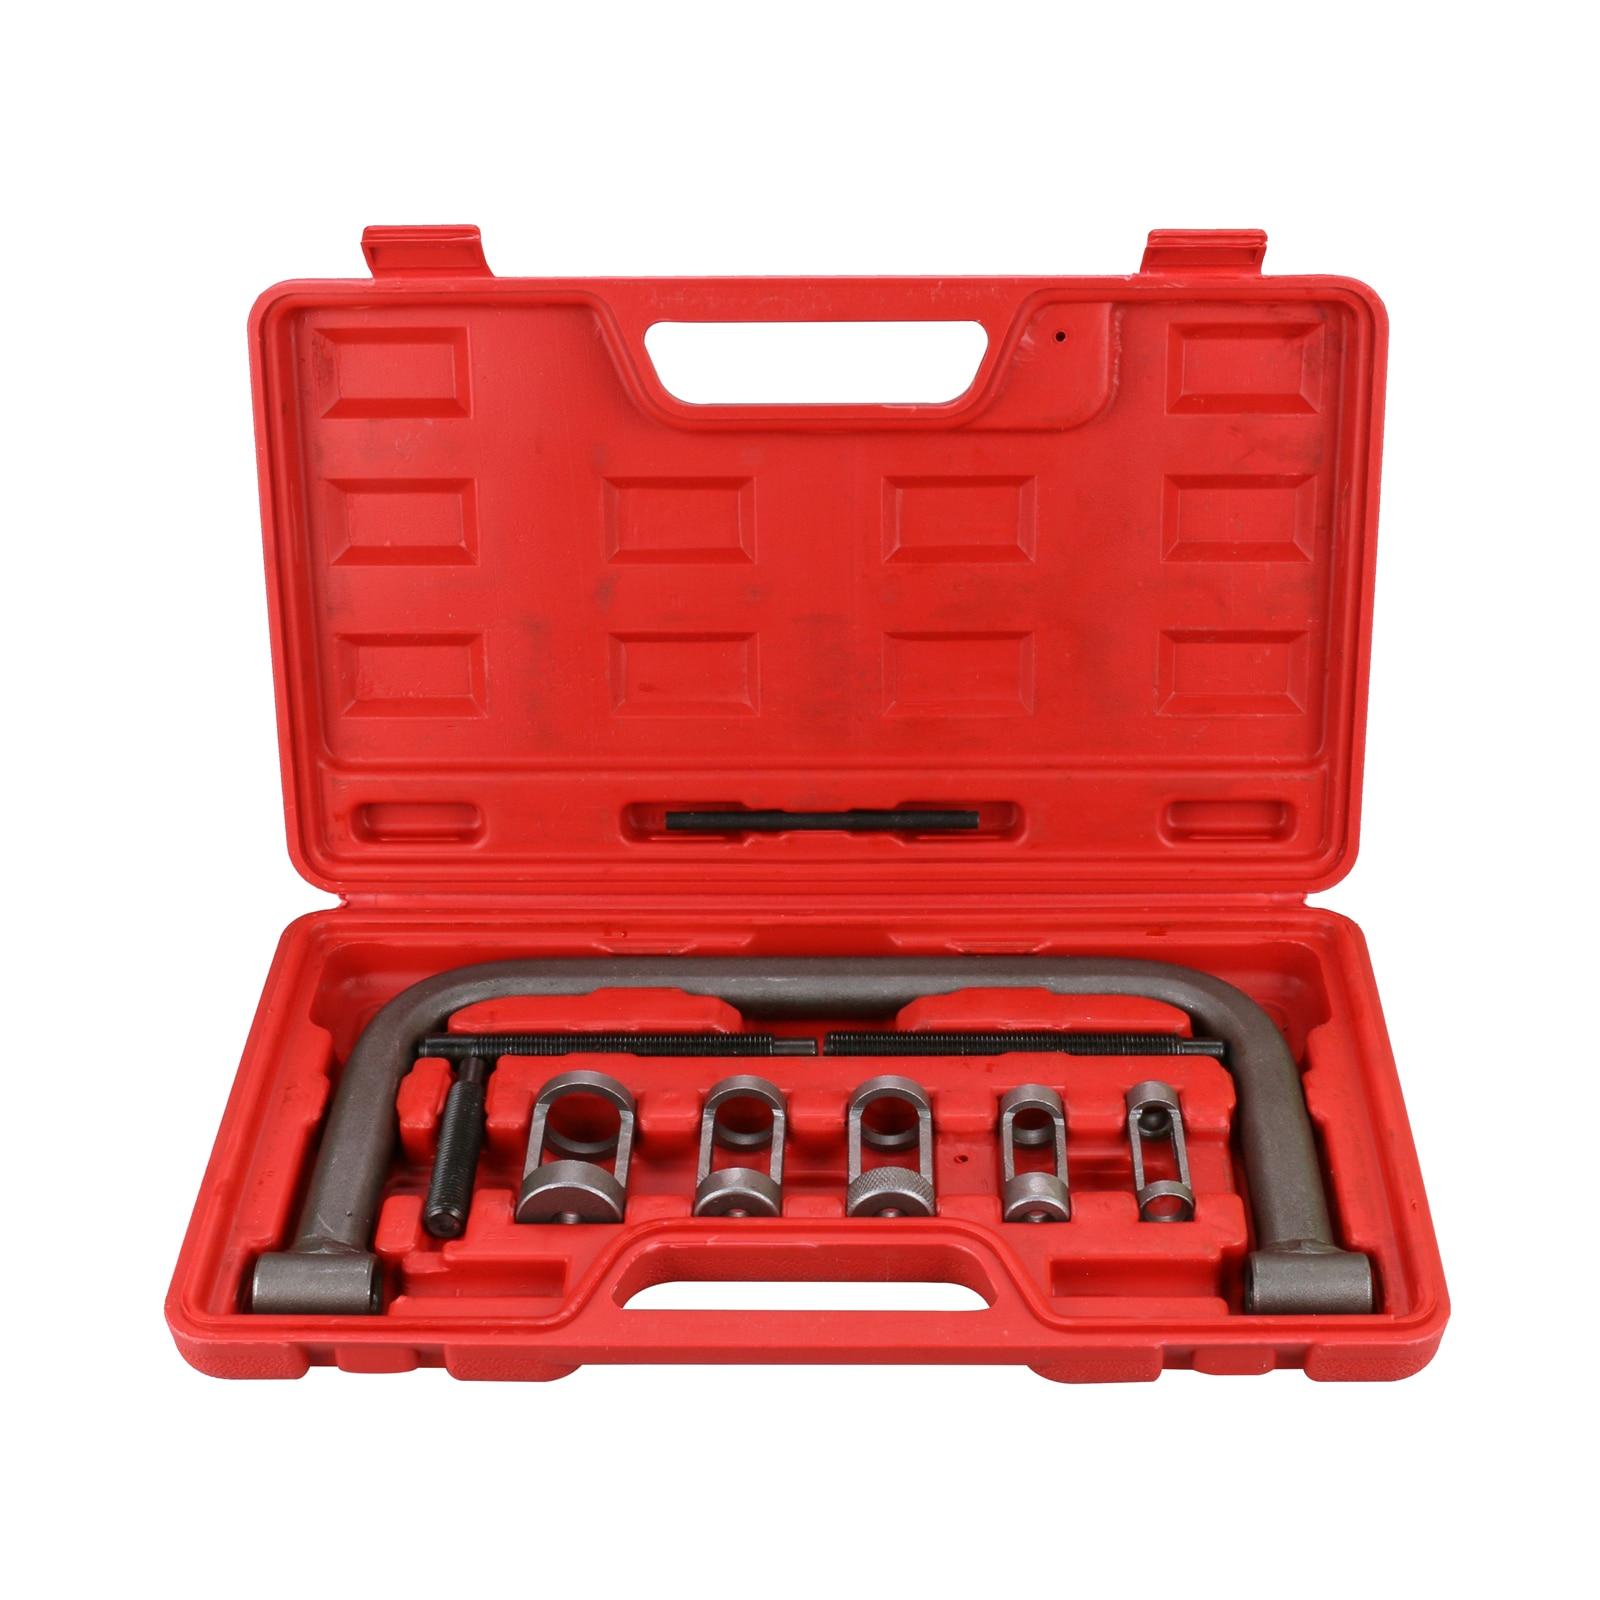 Compressor Removal Tool 10 Pcs//Set Valve Spring Compressor Kit Universal Spring Compressors Removal Installer Tool for Car Van Motorcycle Engines